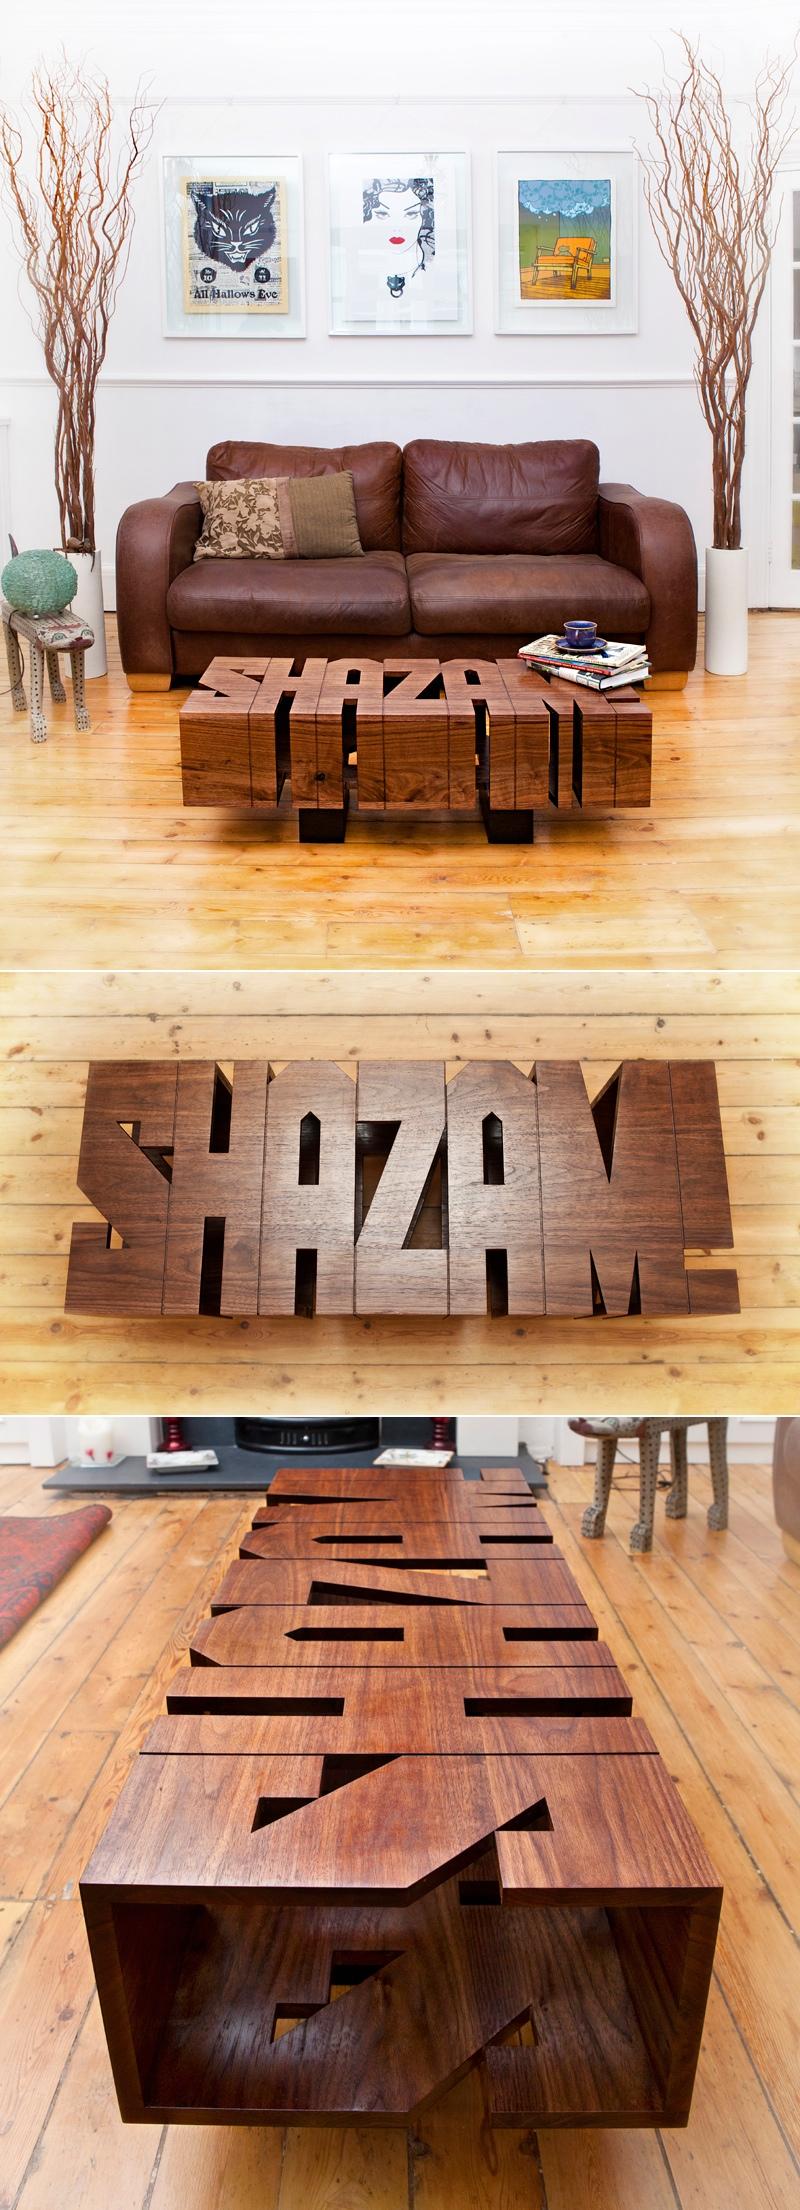 15-custom-coffee-table